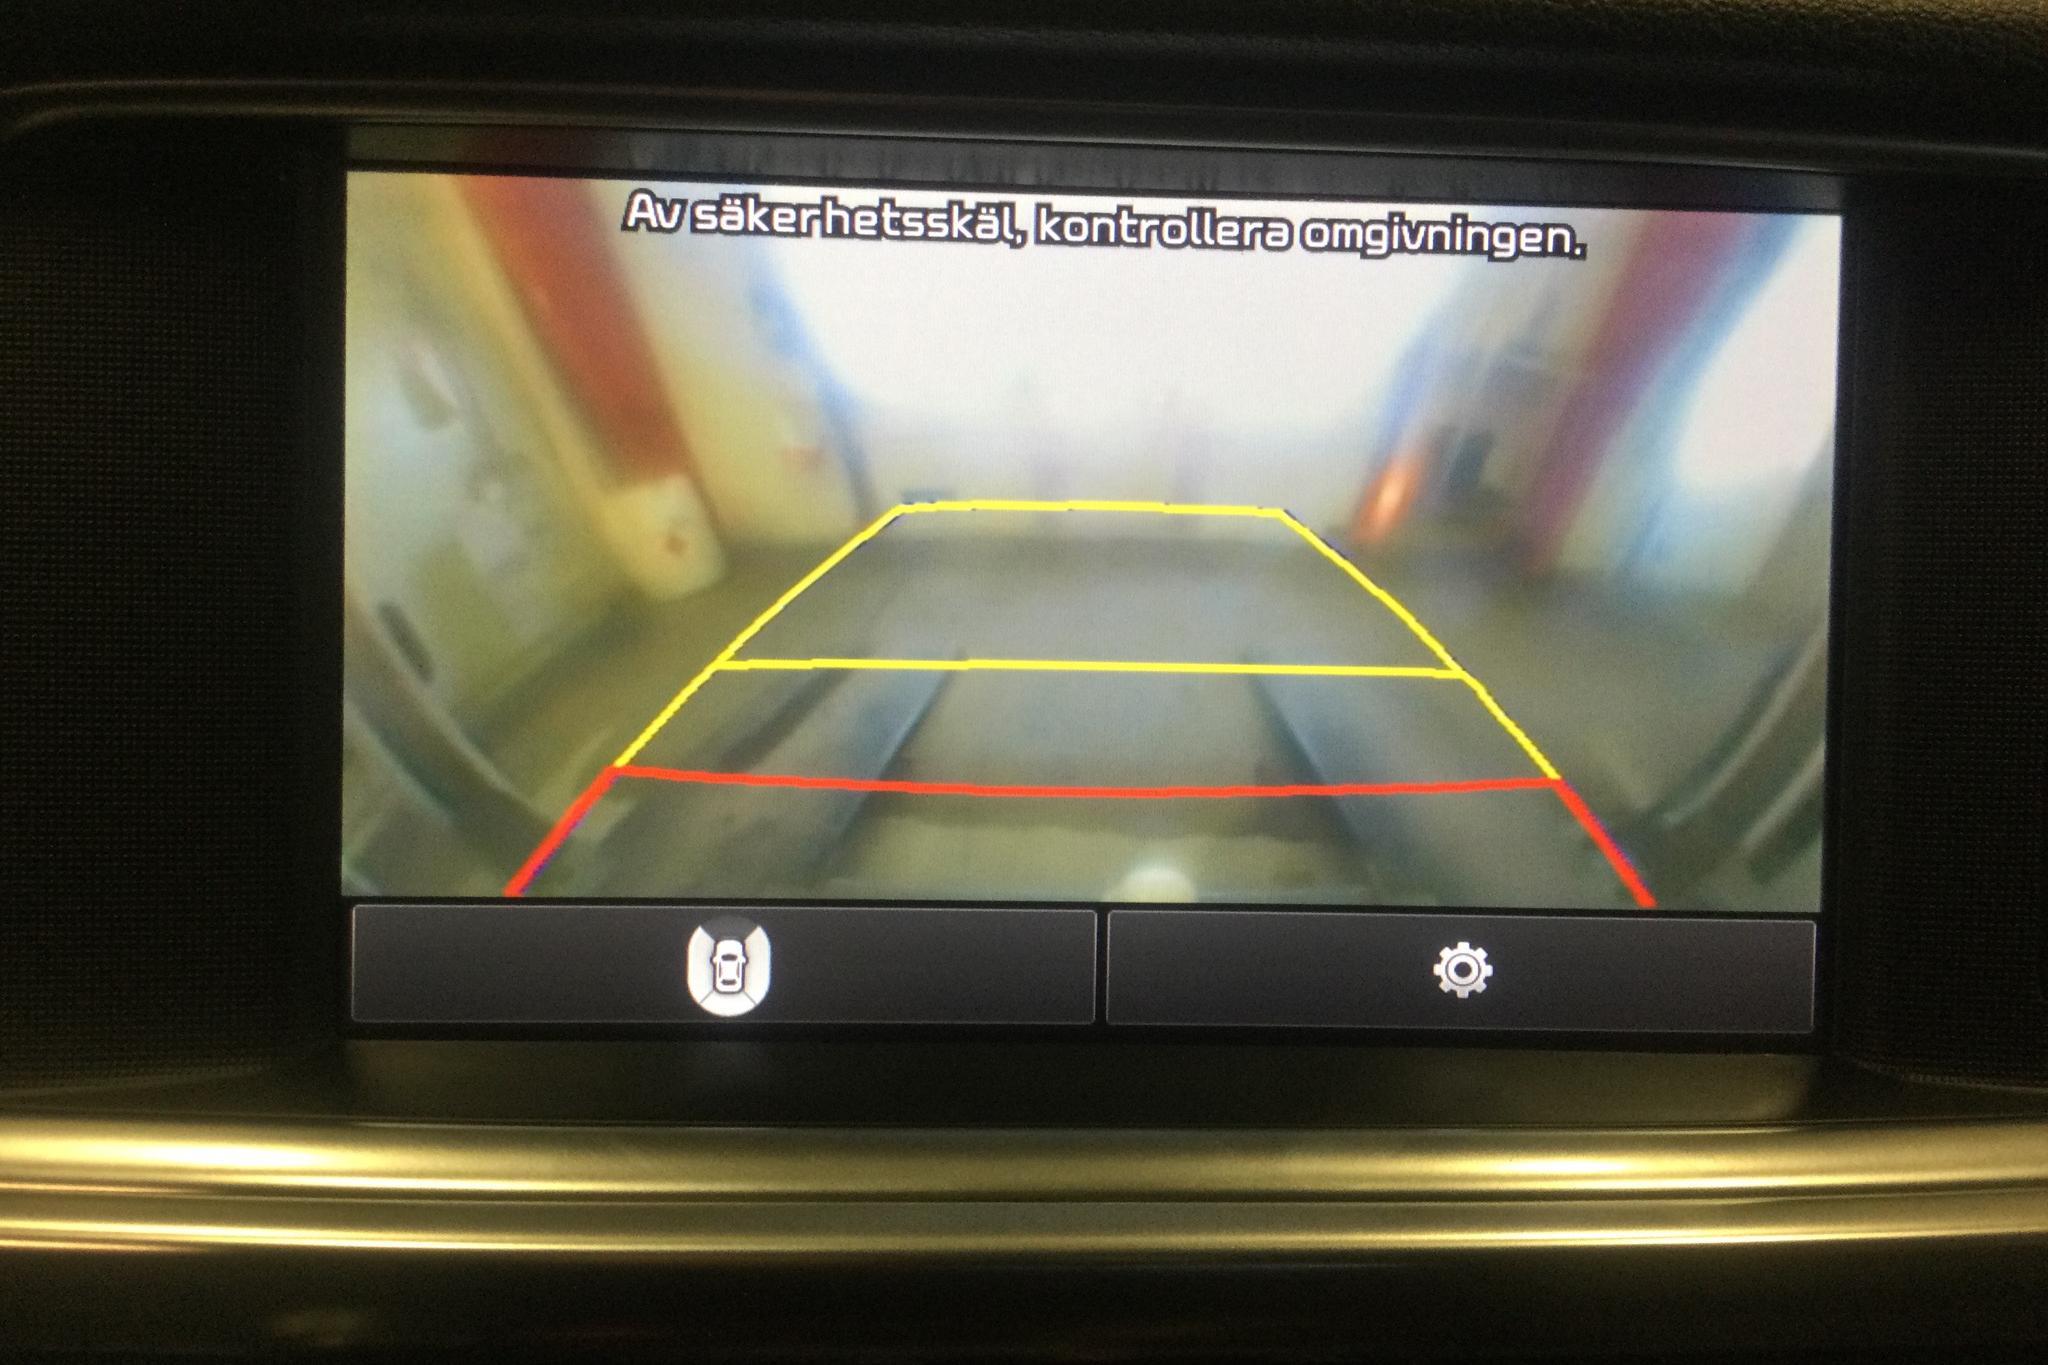 KIA Optima 2.0 GDi Plug-in Hybrid SW (205hk) - 43 100 km - Automatic - gray - 2018